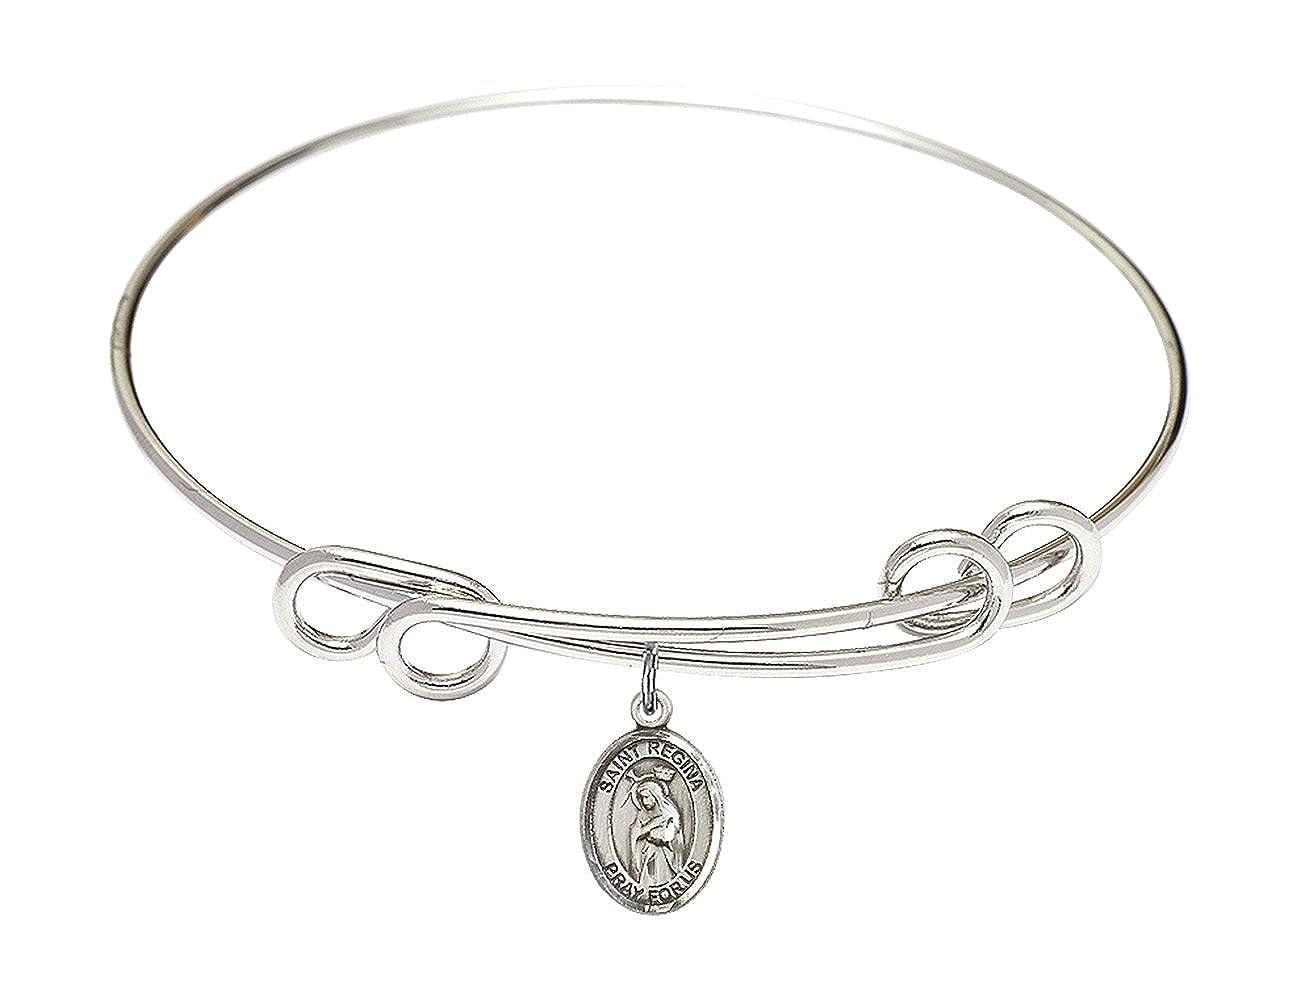 Regina Charm. DiamondJewelryNY Double Loop Bangle Bracelet with a St